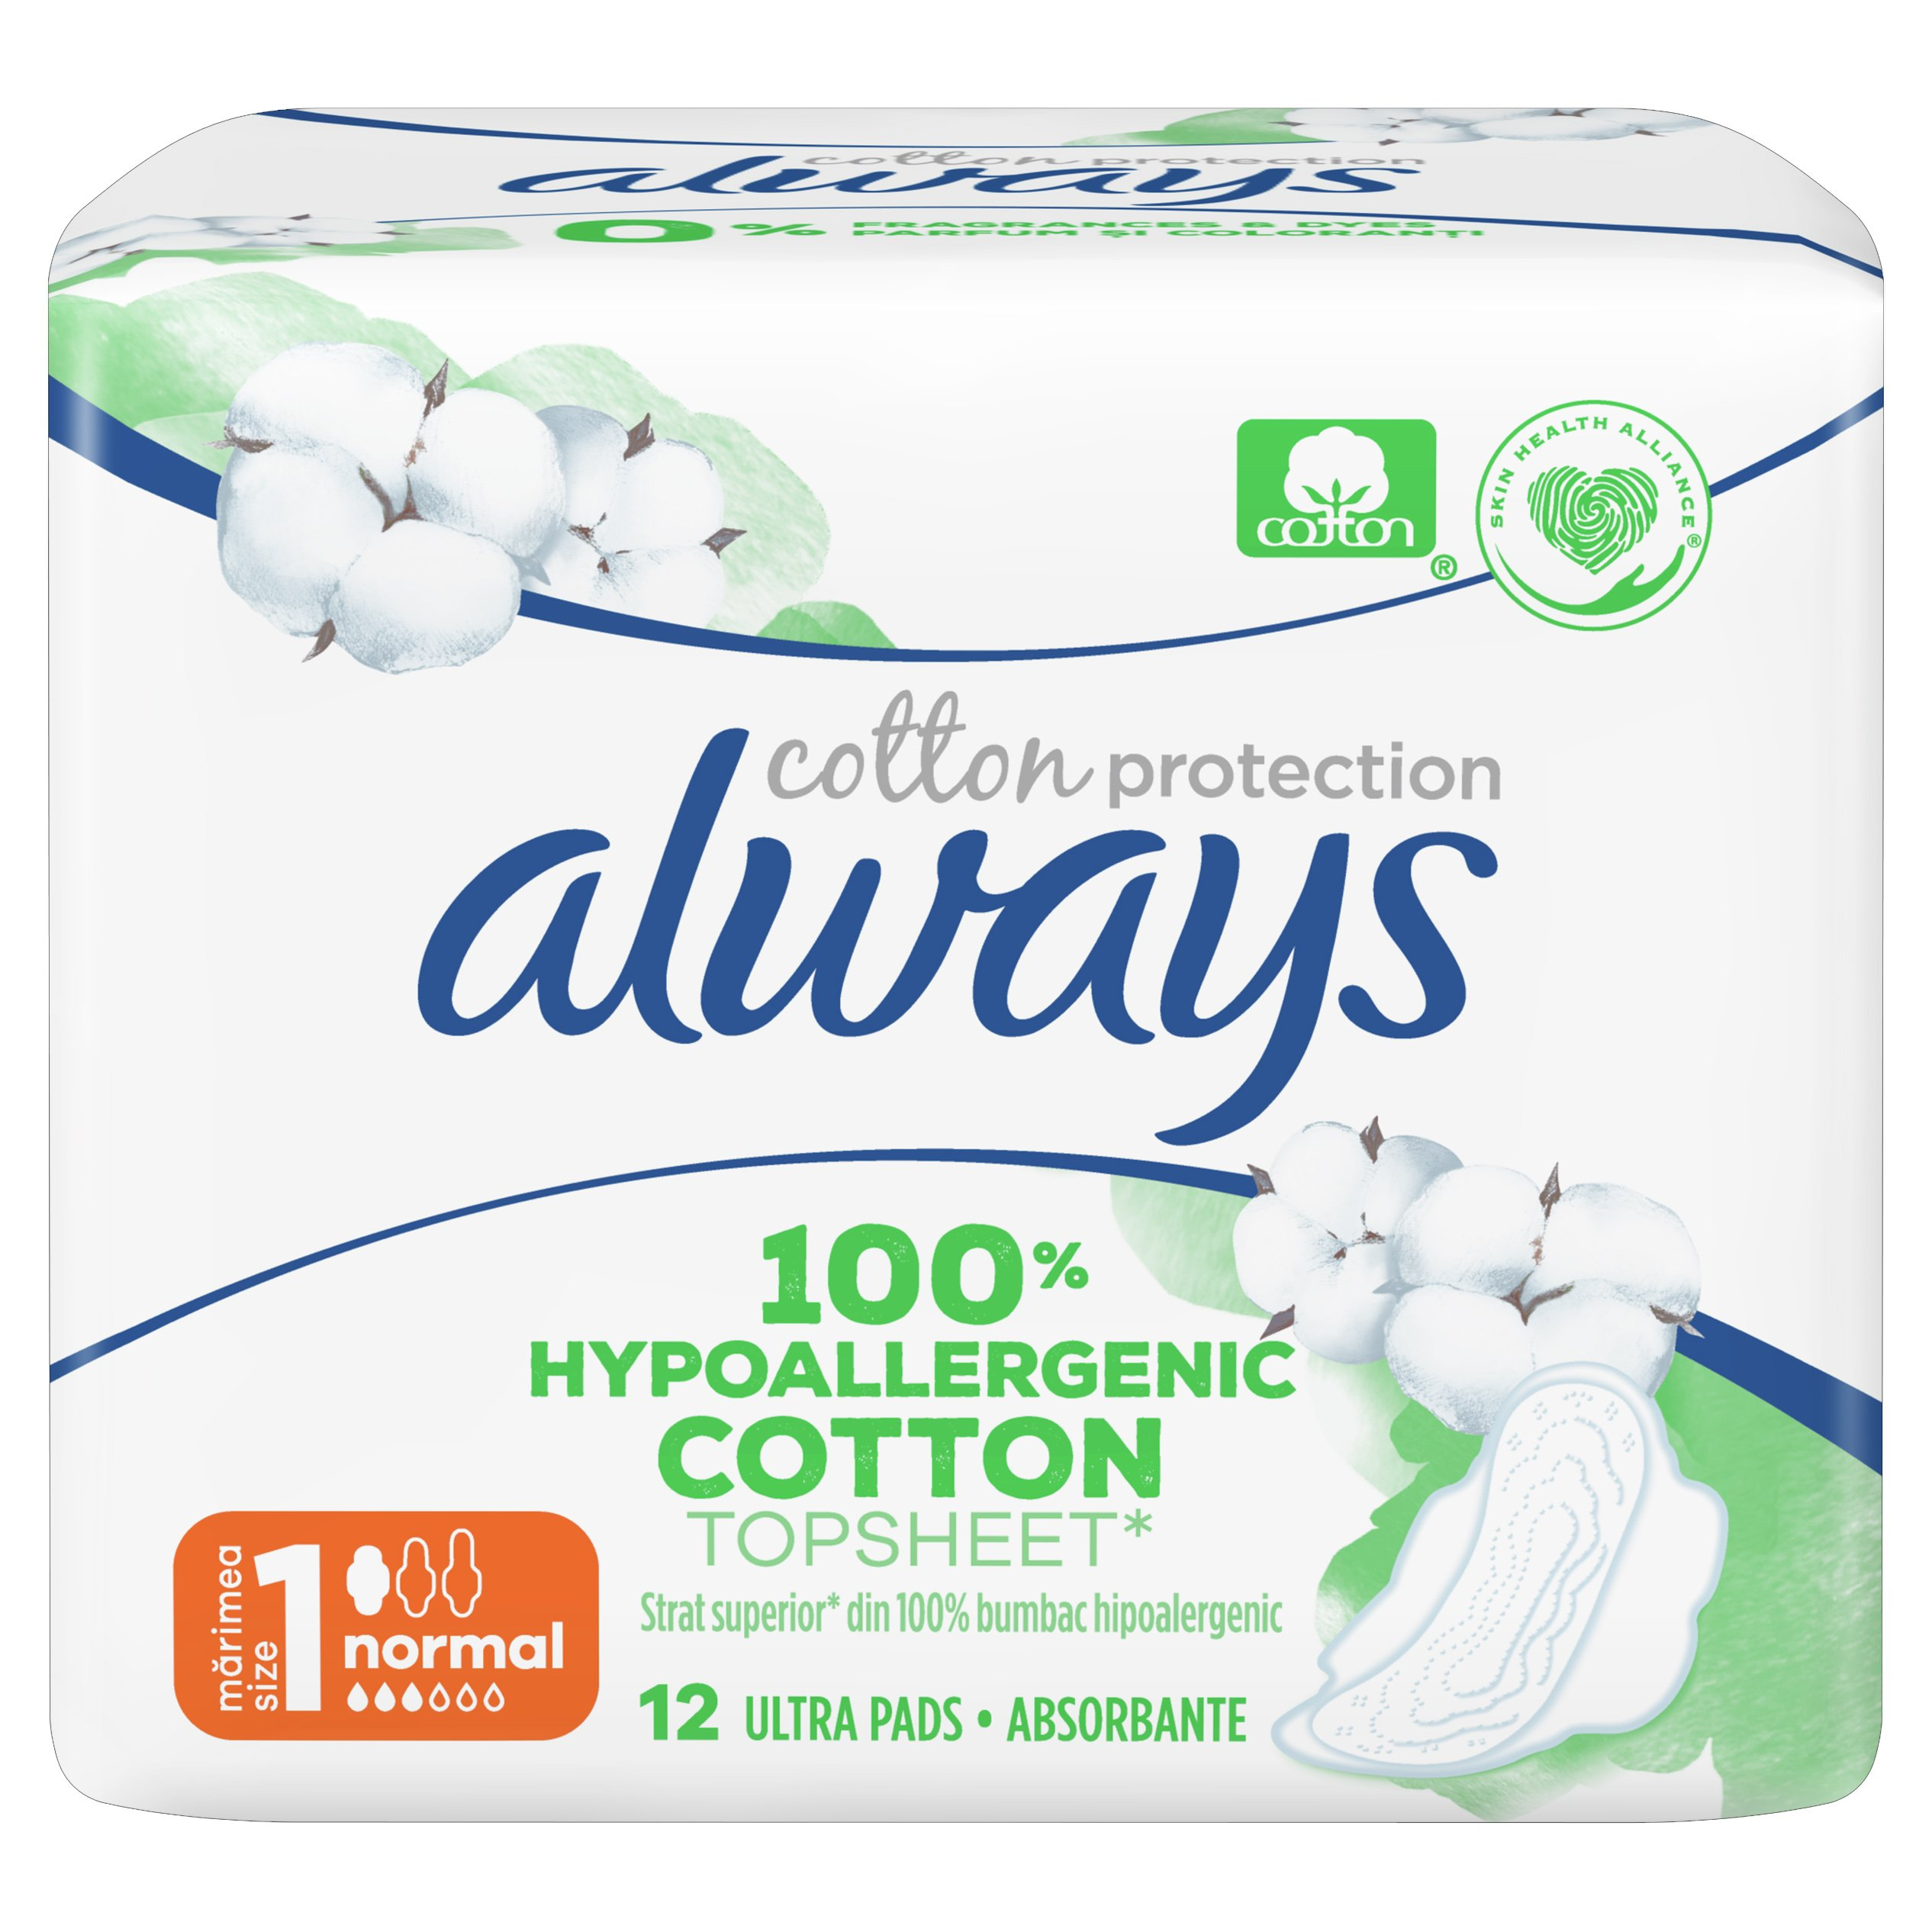 Always Cotton Protection Normal Σερβιέτες με Φτερά & Κάλυμμα από 100% Οργανικό Βαμβάκι για Κανονική Ροή 12 Pads